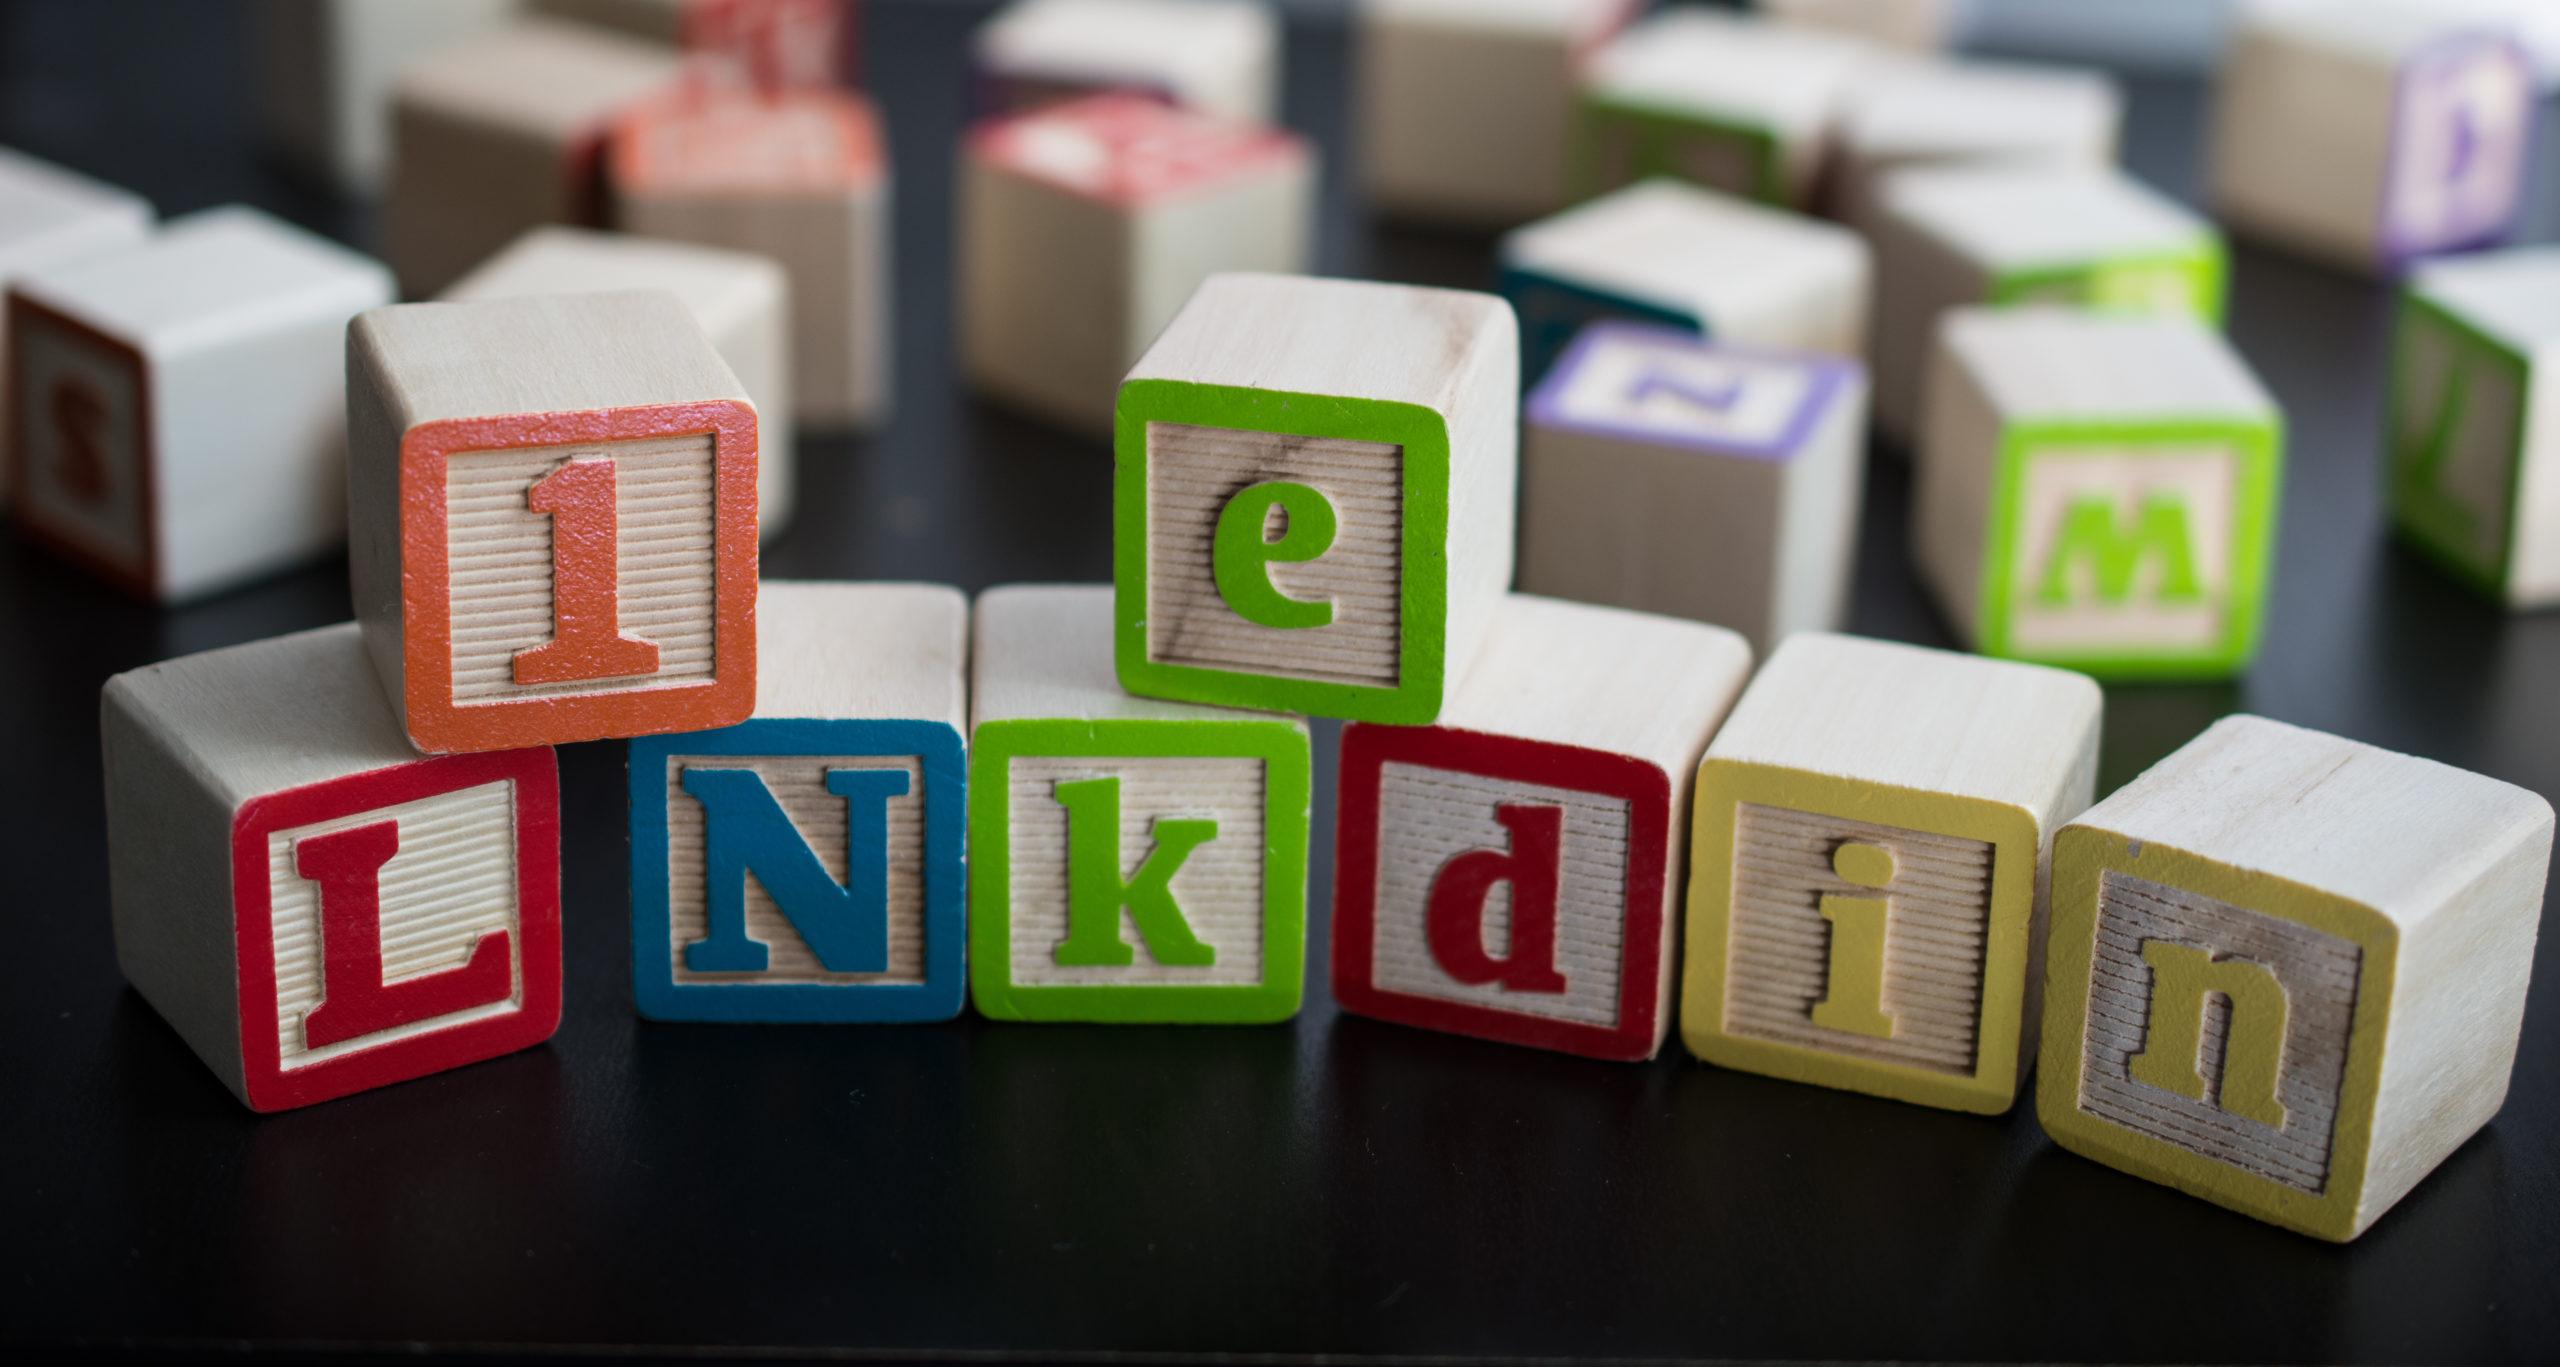 Blocks Spelling LinkedIn